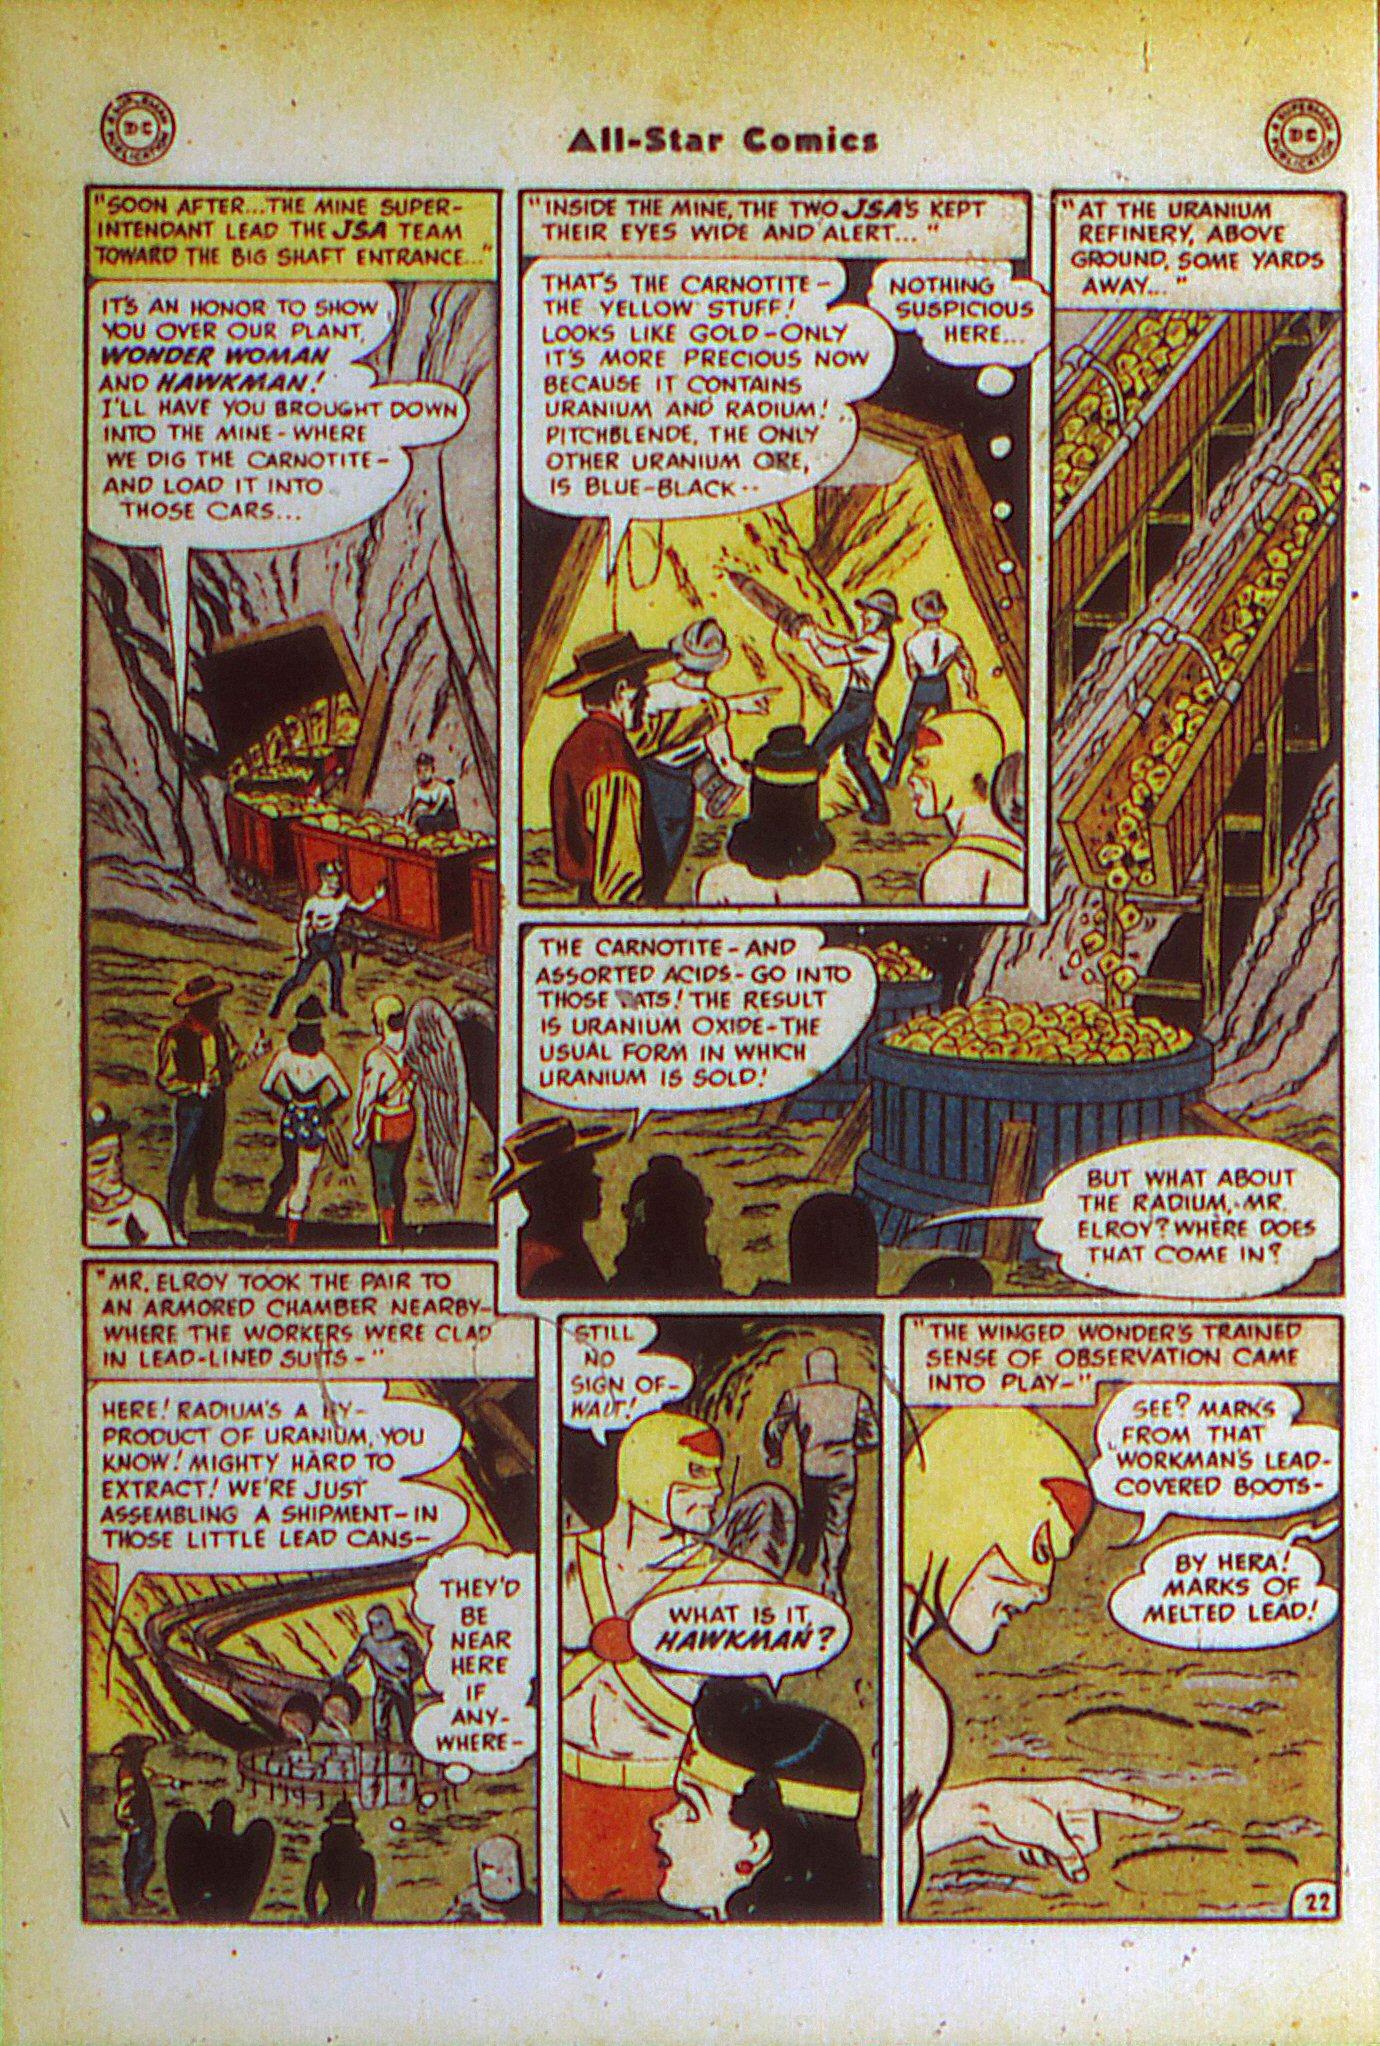 Read online All-Star Comics comic -  Issue #49 - 26